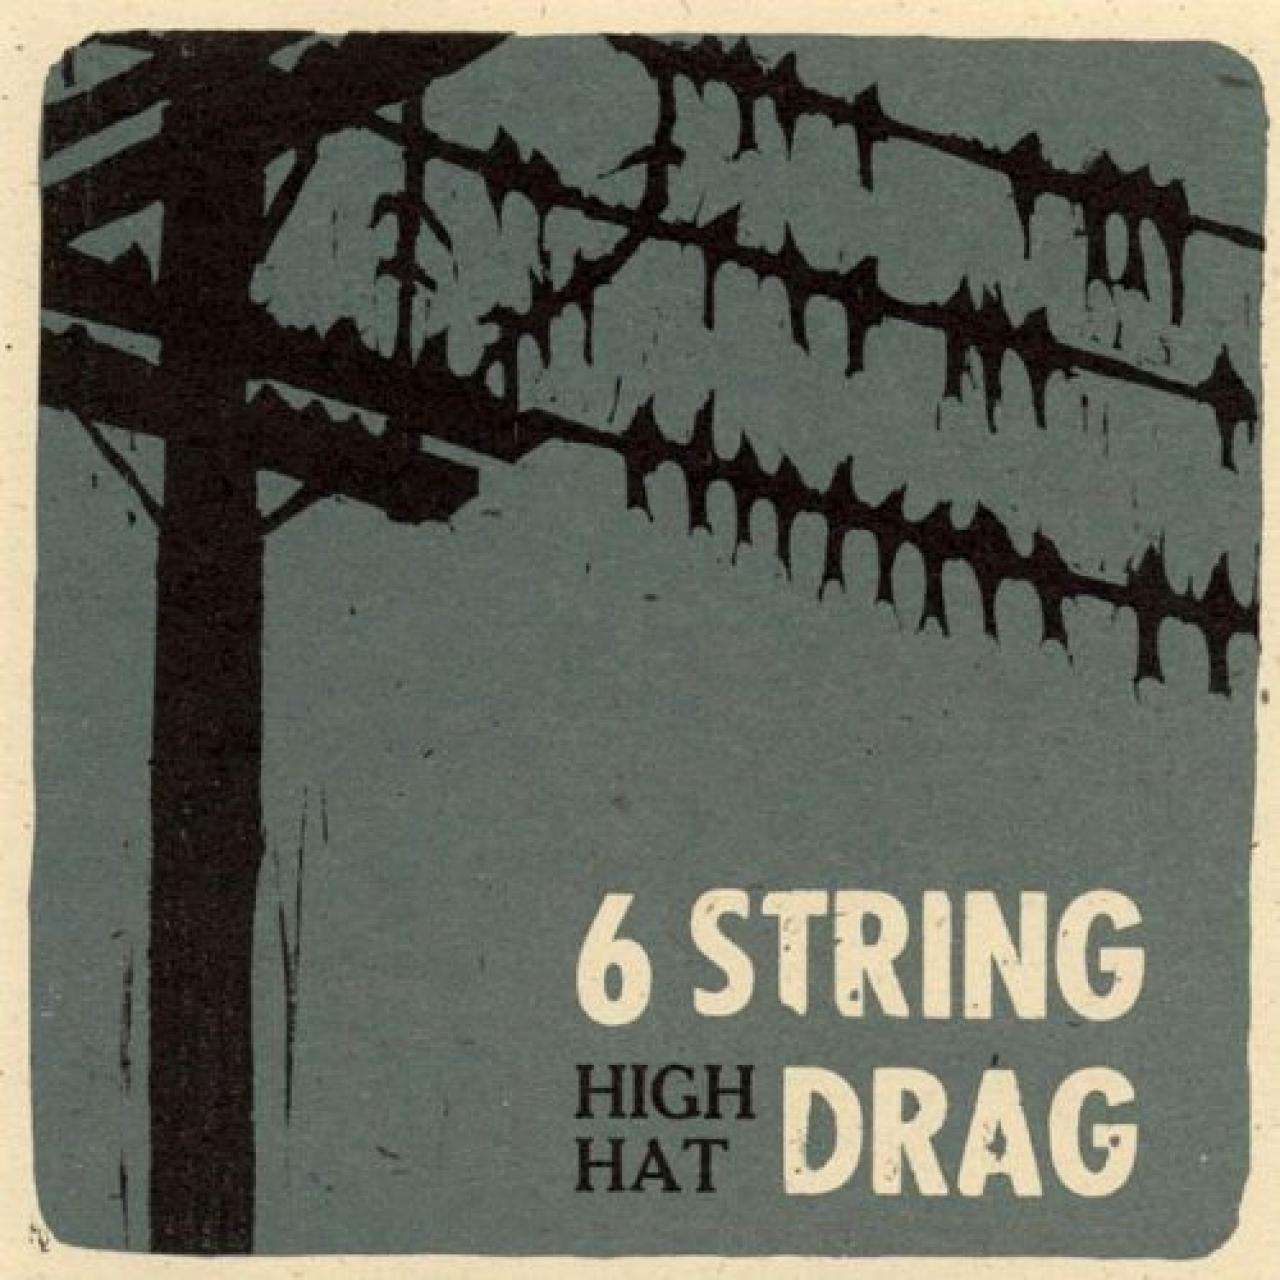 6 String Drag High Hat